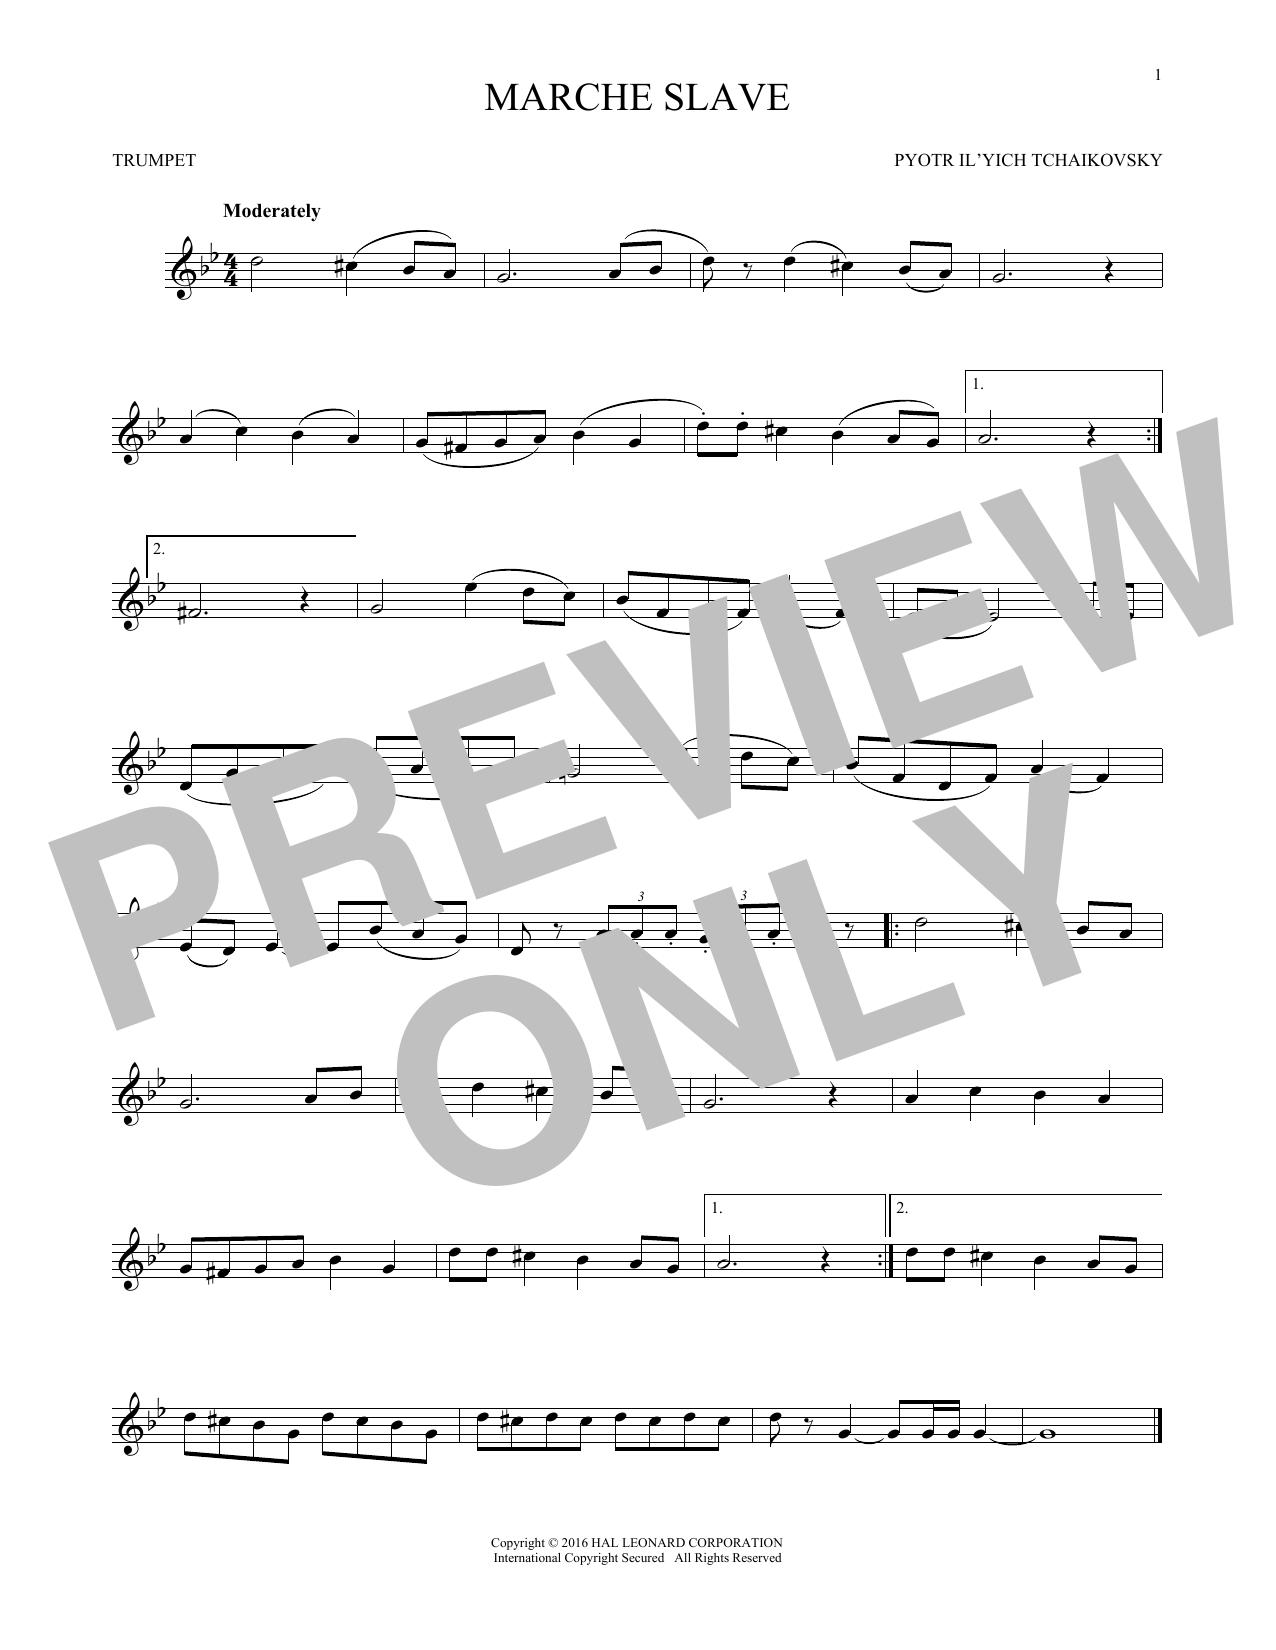 Marche Slav, Op. 31 (Trumpet Solo)